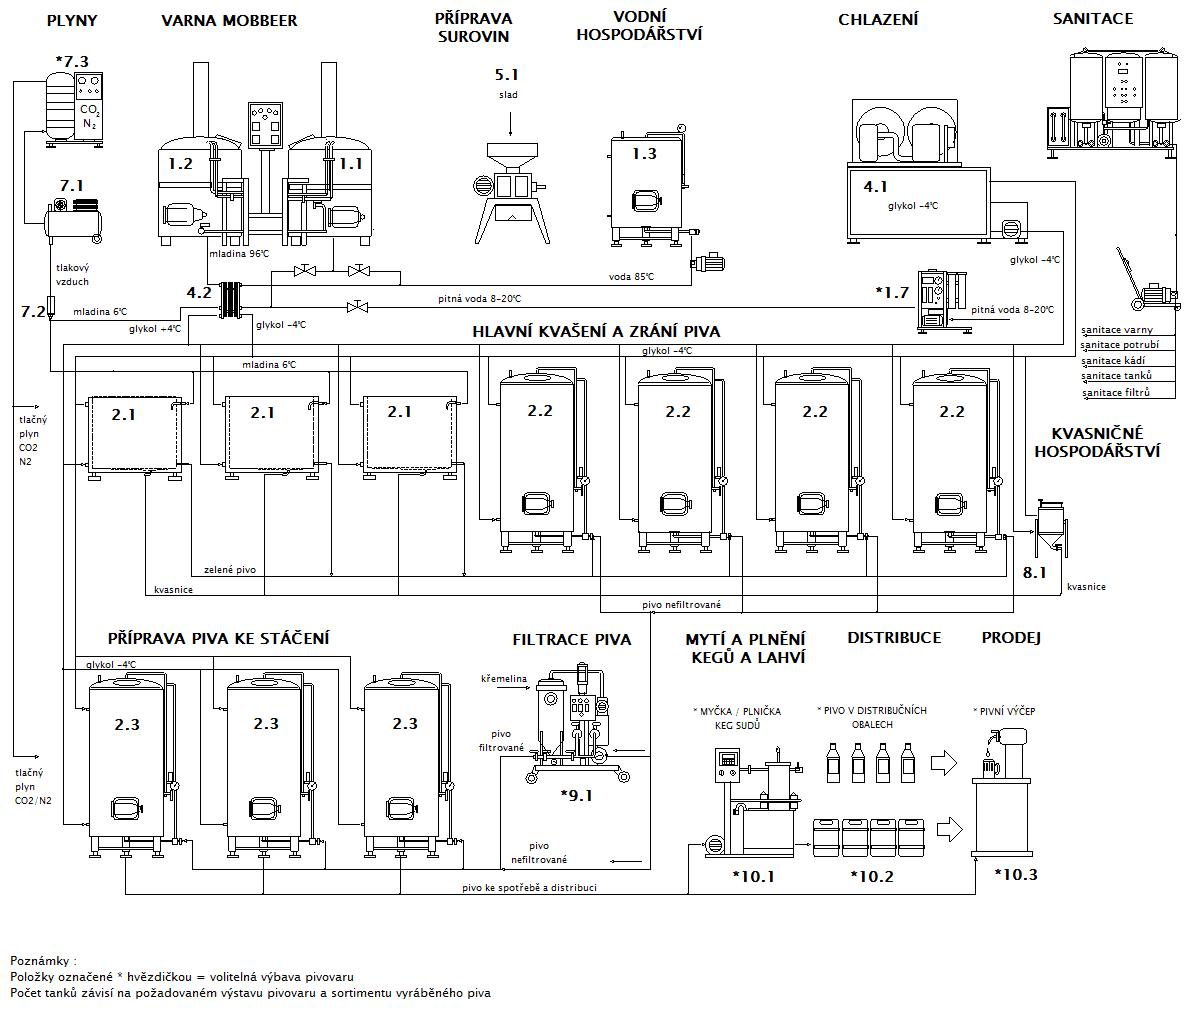 Blokové schéma minipivovaru MOBBEER OF